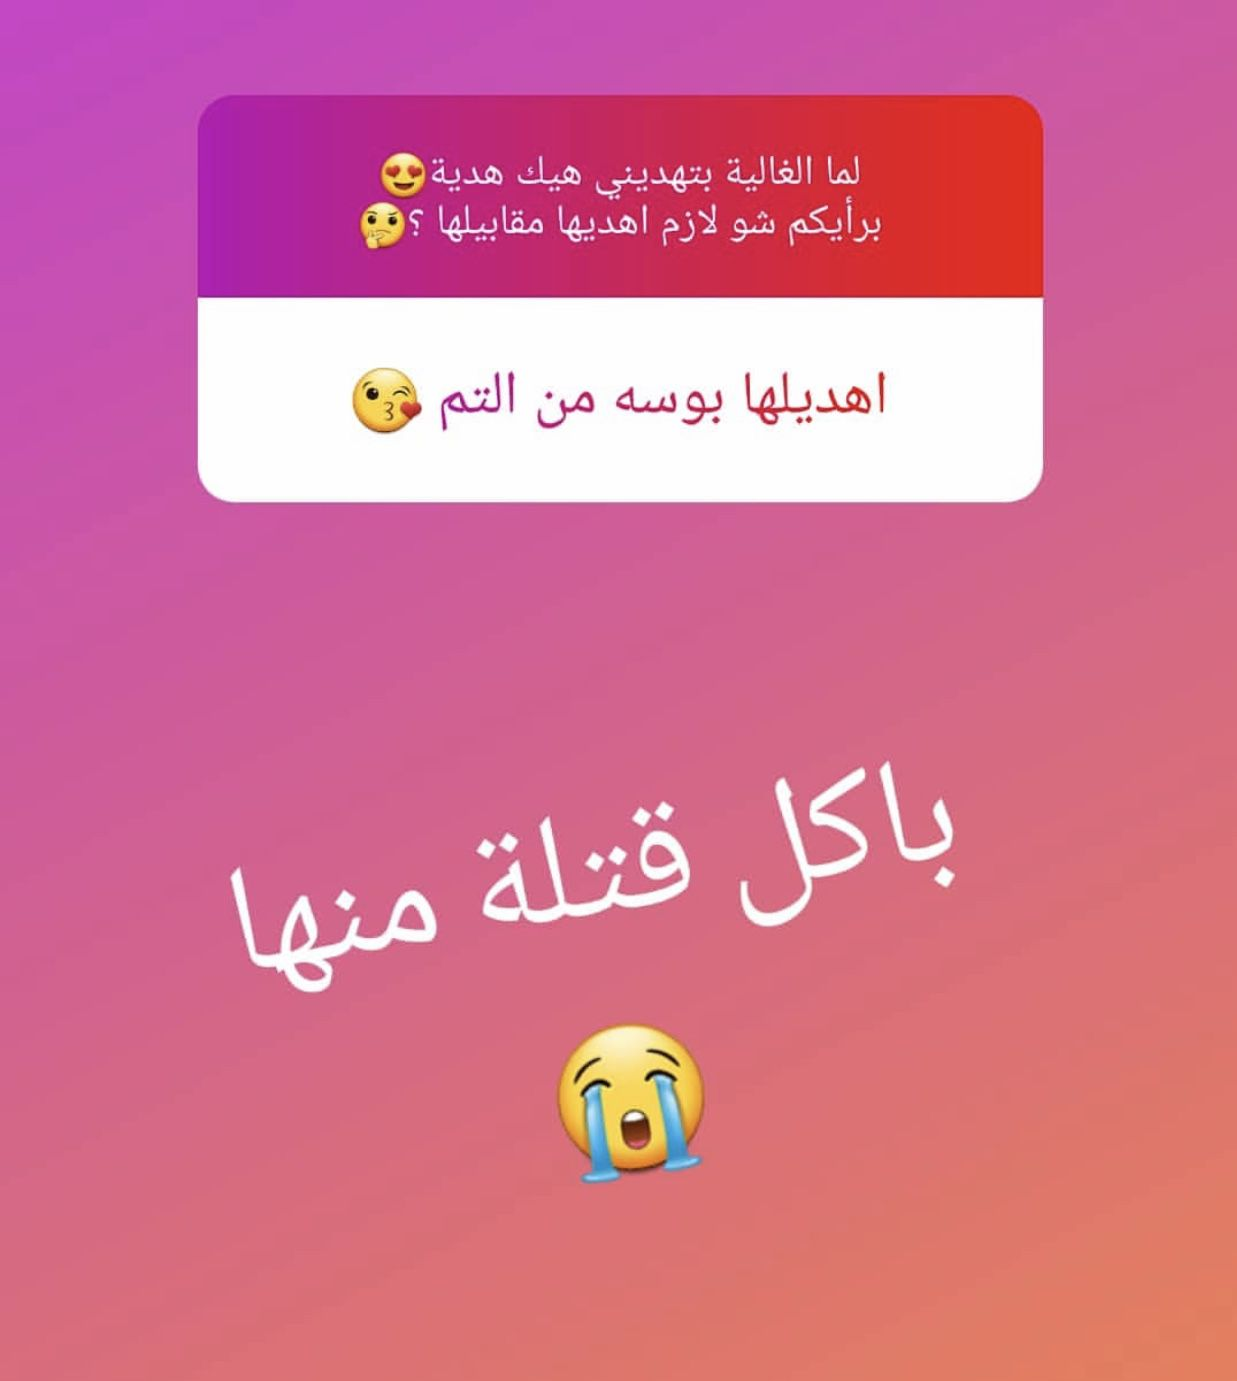 رد مصطفى الخاني